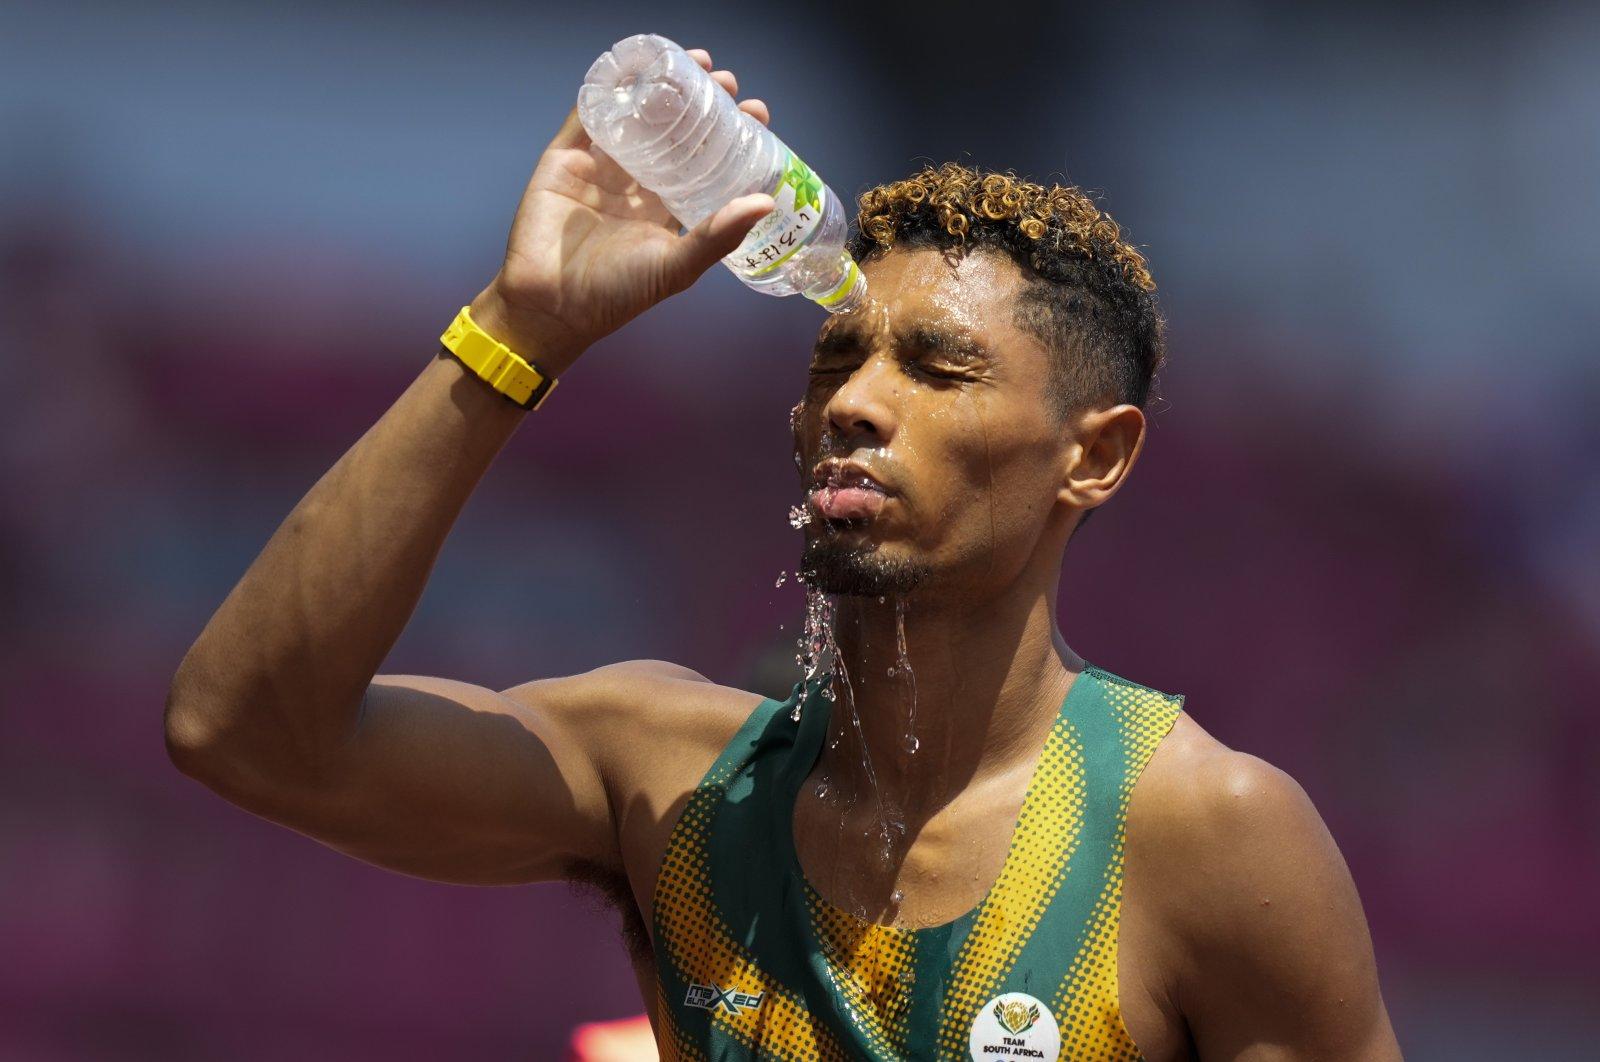 South Africa's Wayde Van Niekerk cools off after a heat in the men's 400-meter run at the 2020 Summer Olympics, Tokyo, Japan, Aug. 1, 2021. (AP Photo)